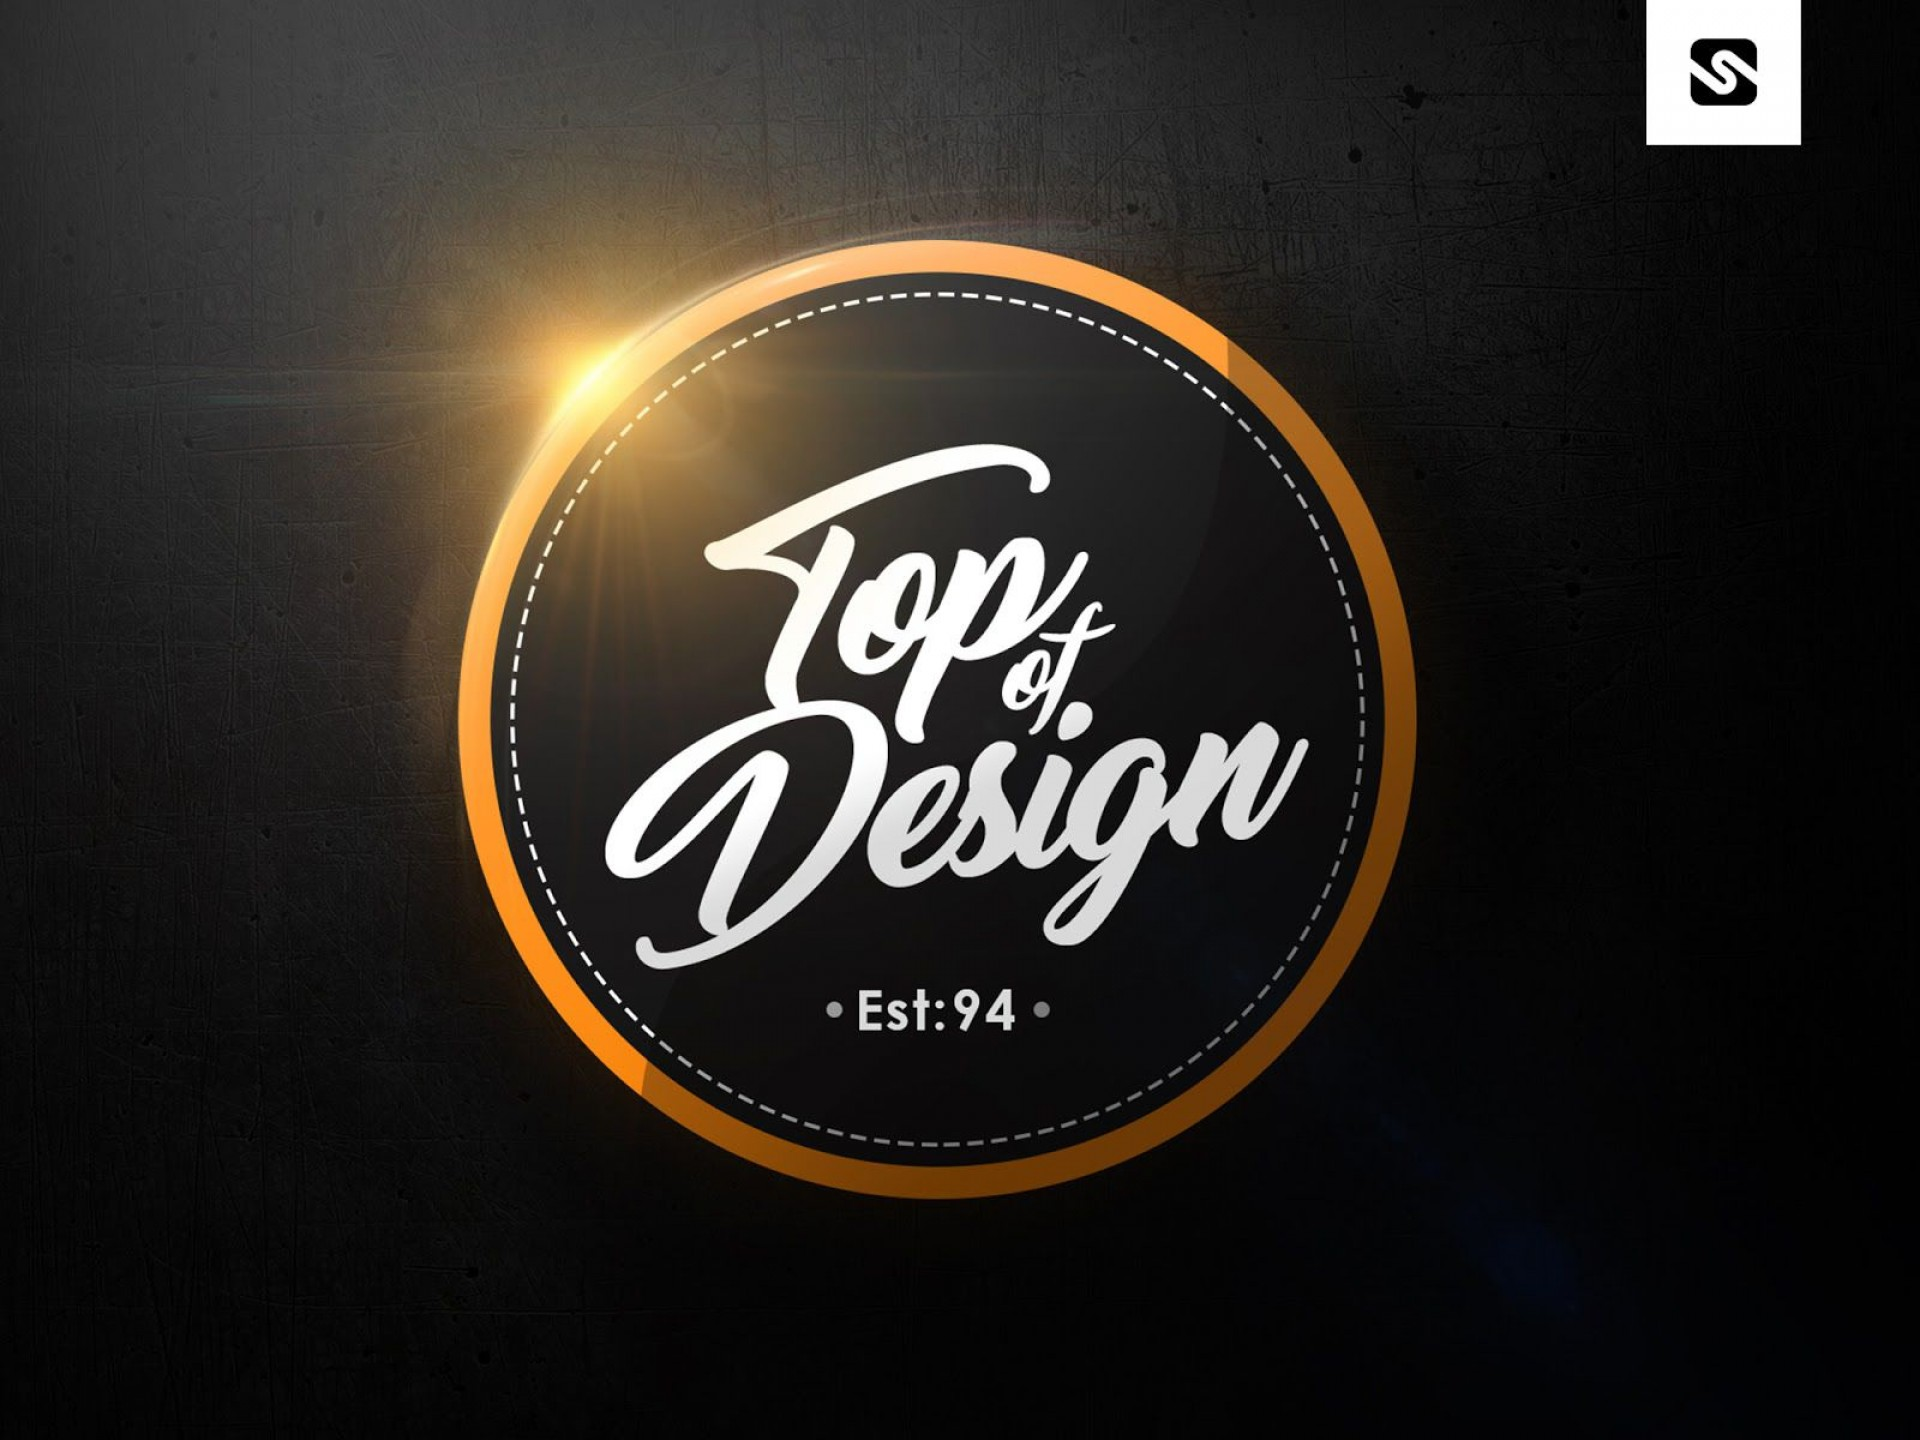 008 Sensational Free Logo Template Psd High Resolution  Photoshop Mockup1920